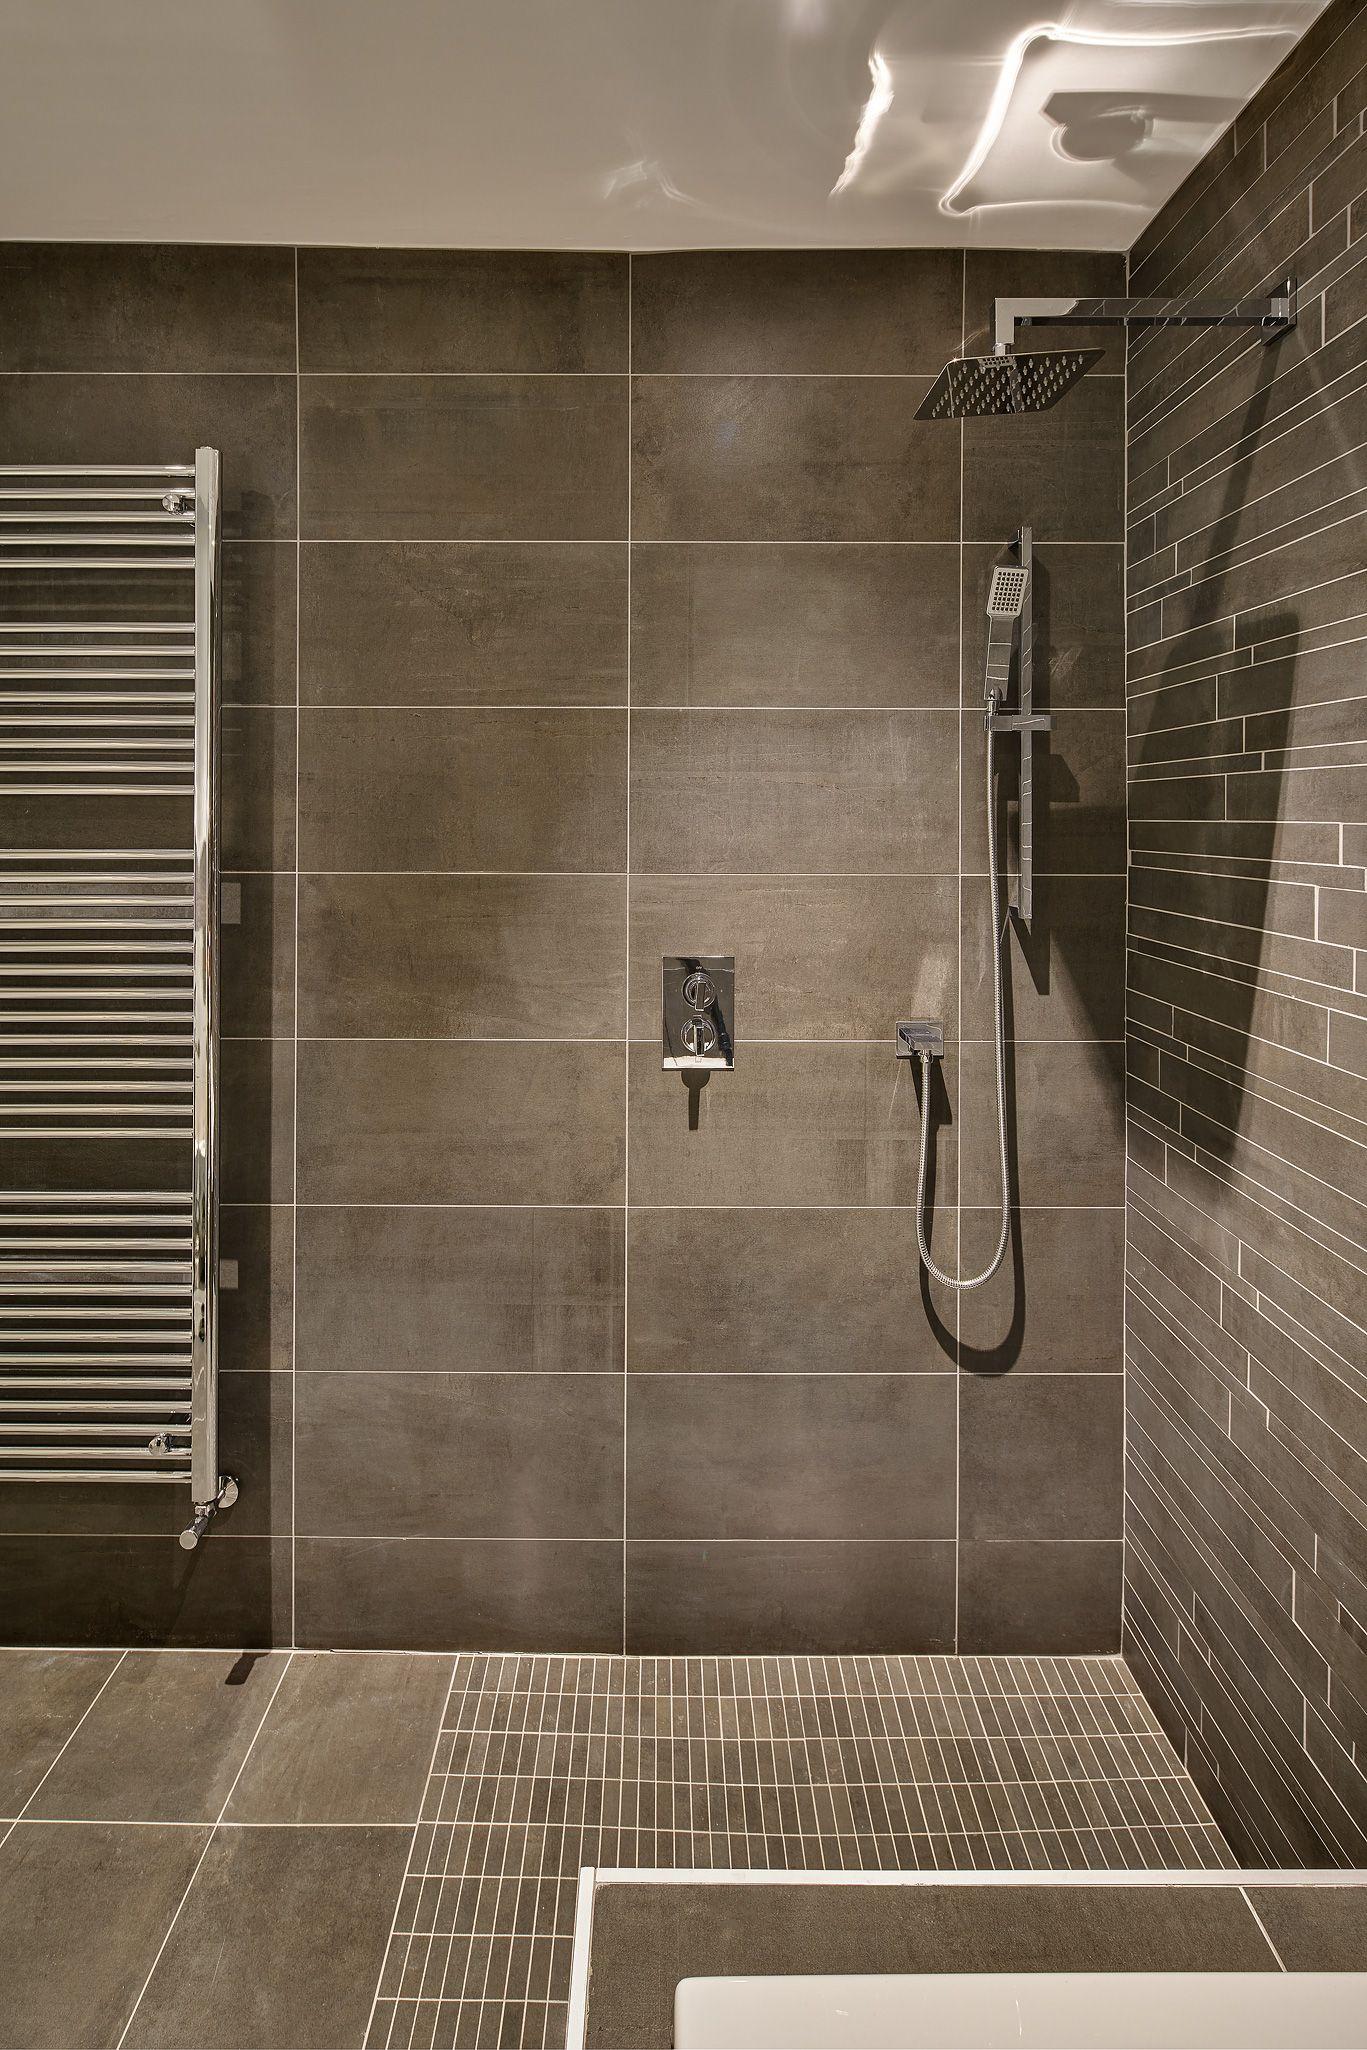 Icon Grey Icon Grey Muretto Stripes Icon Grey Mosaic Rectangular Tiles Bathroom Wall Cladding Stone Cladding Tile Bathroom